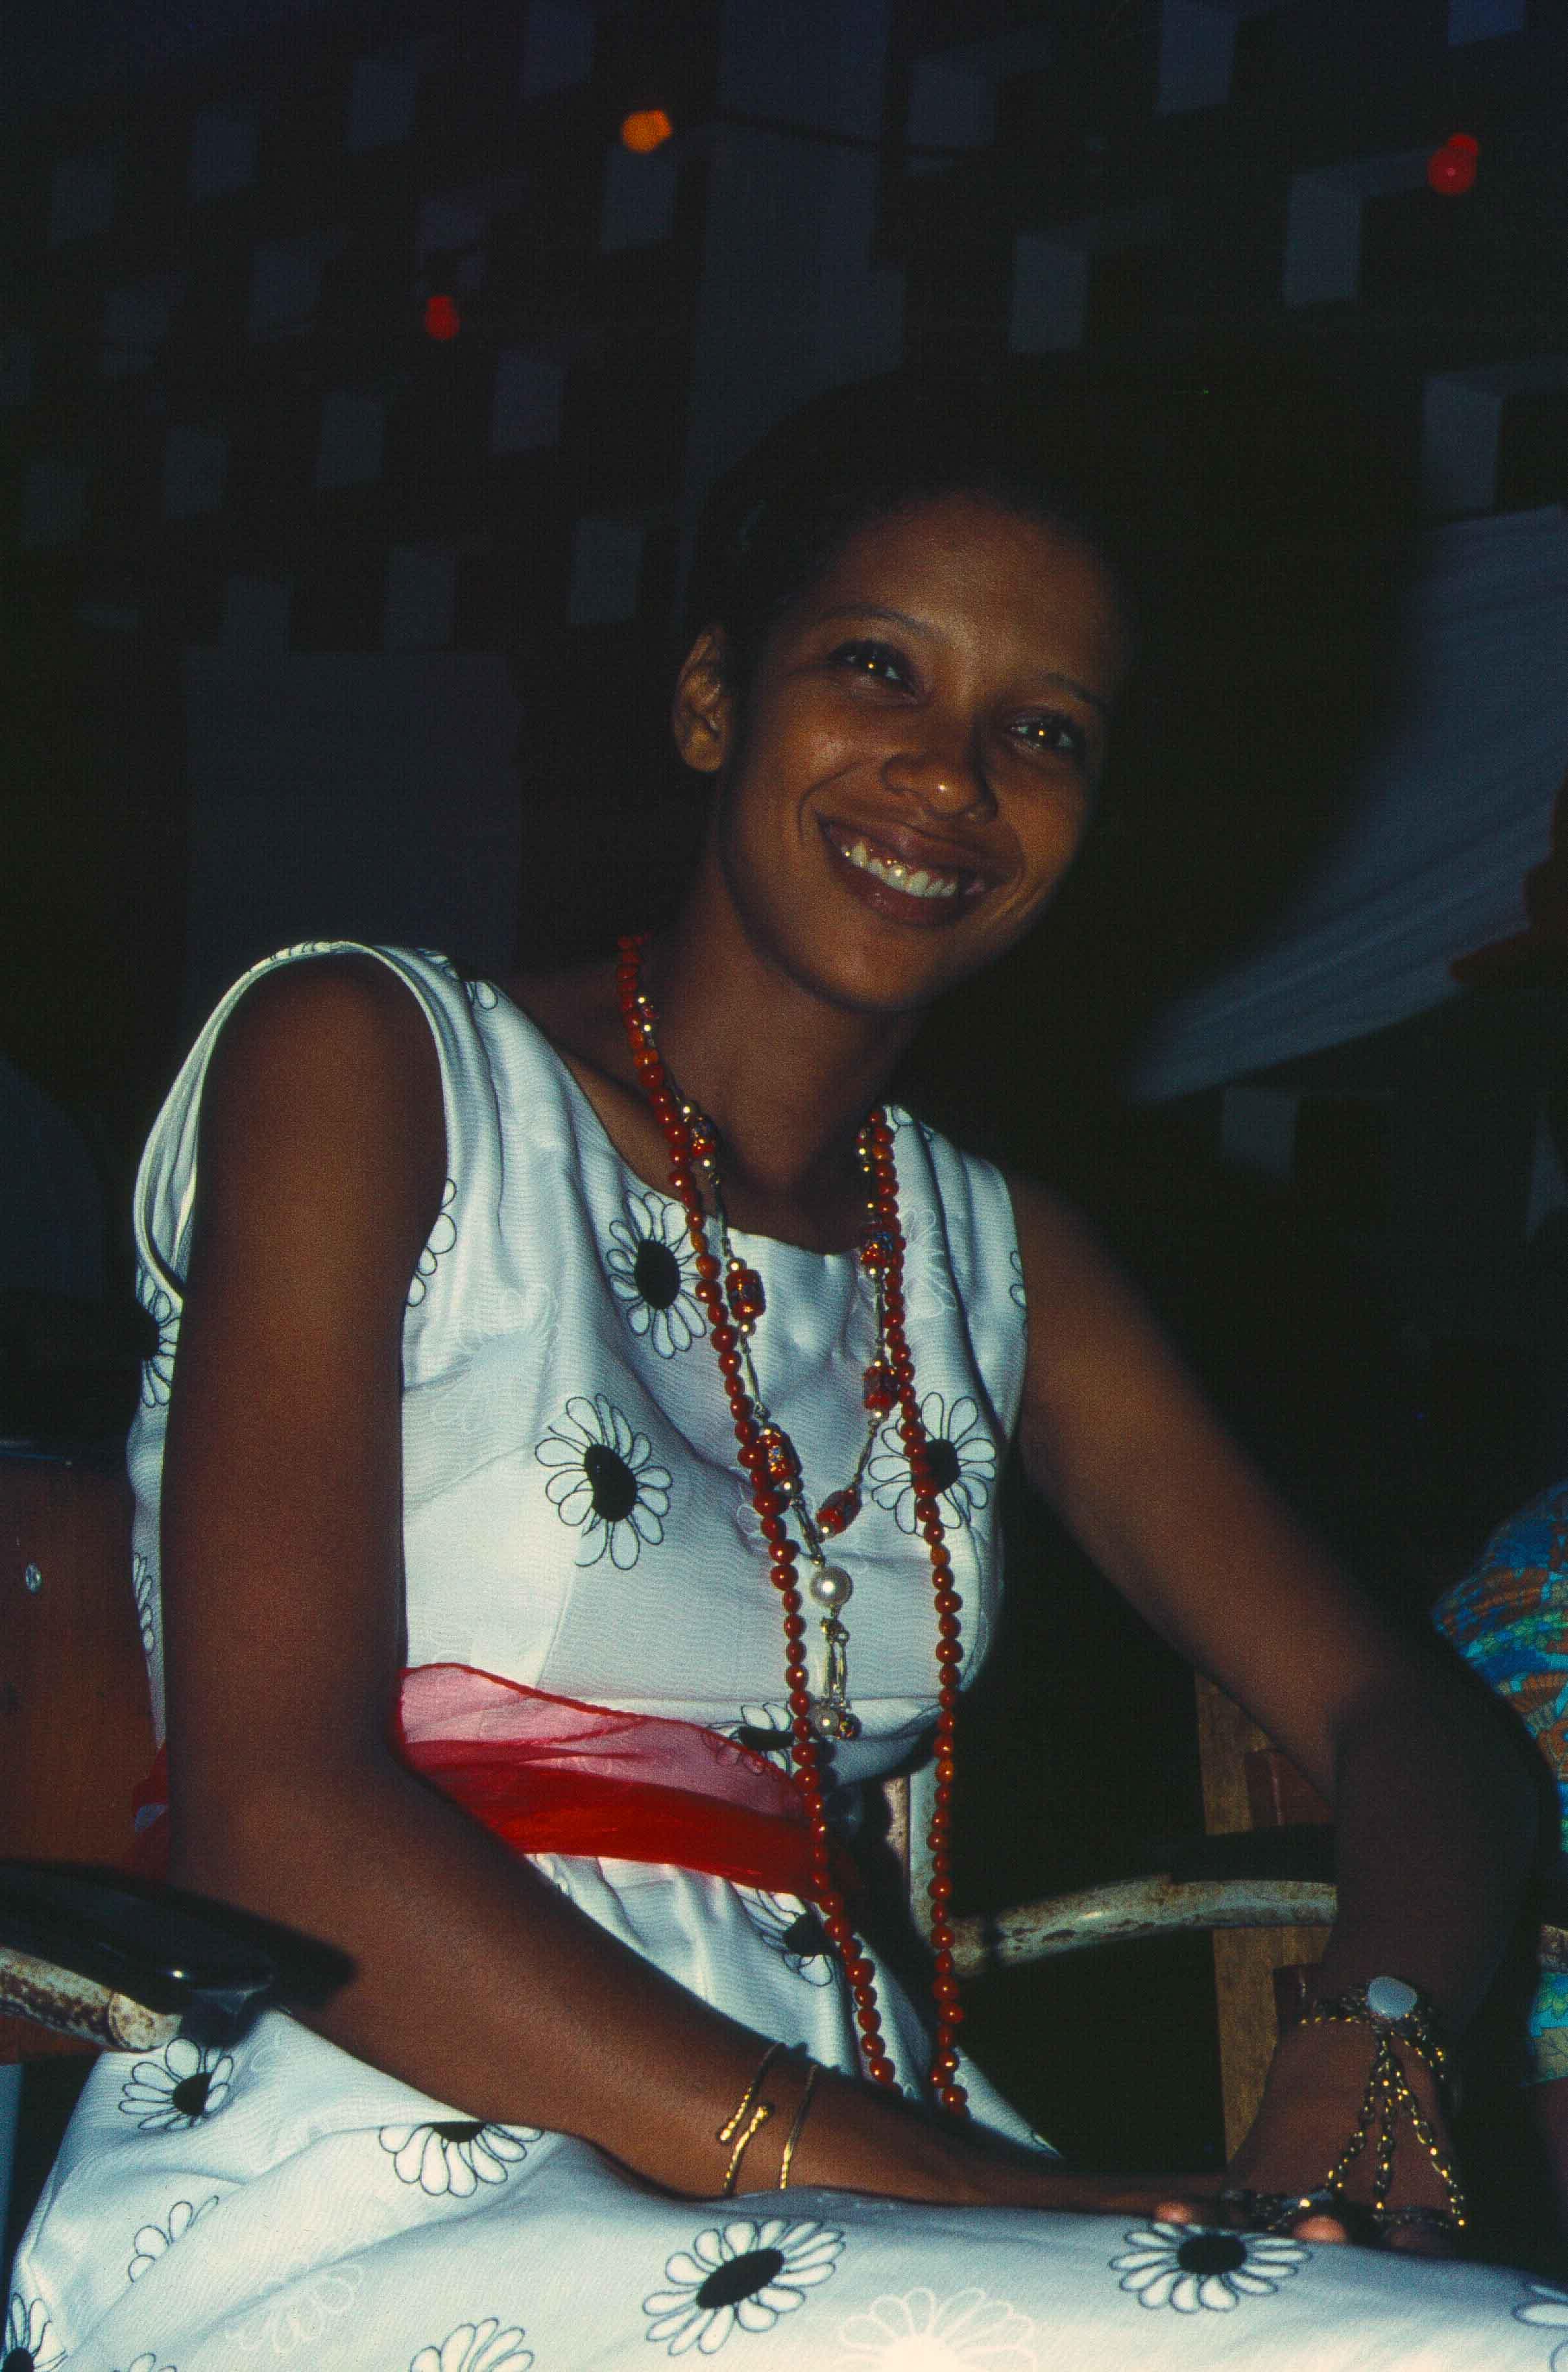 324. Suriname